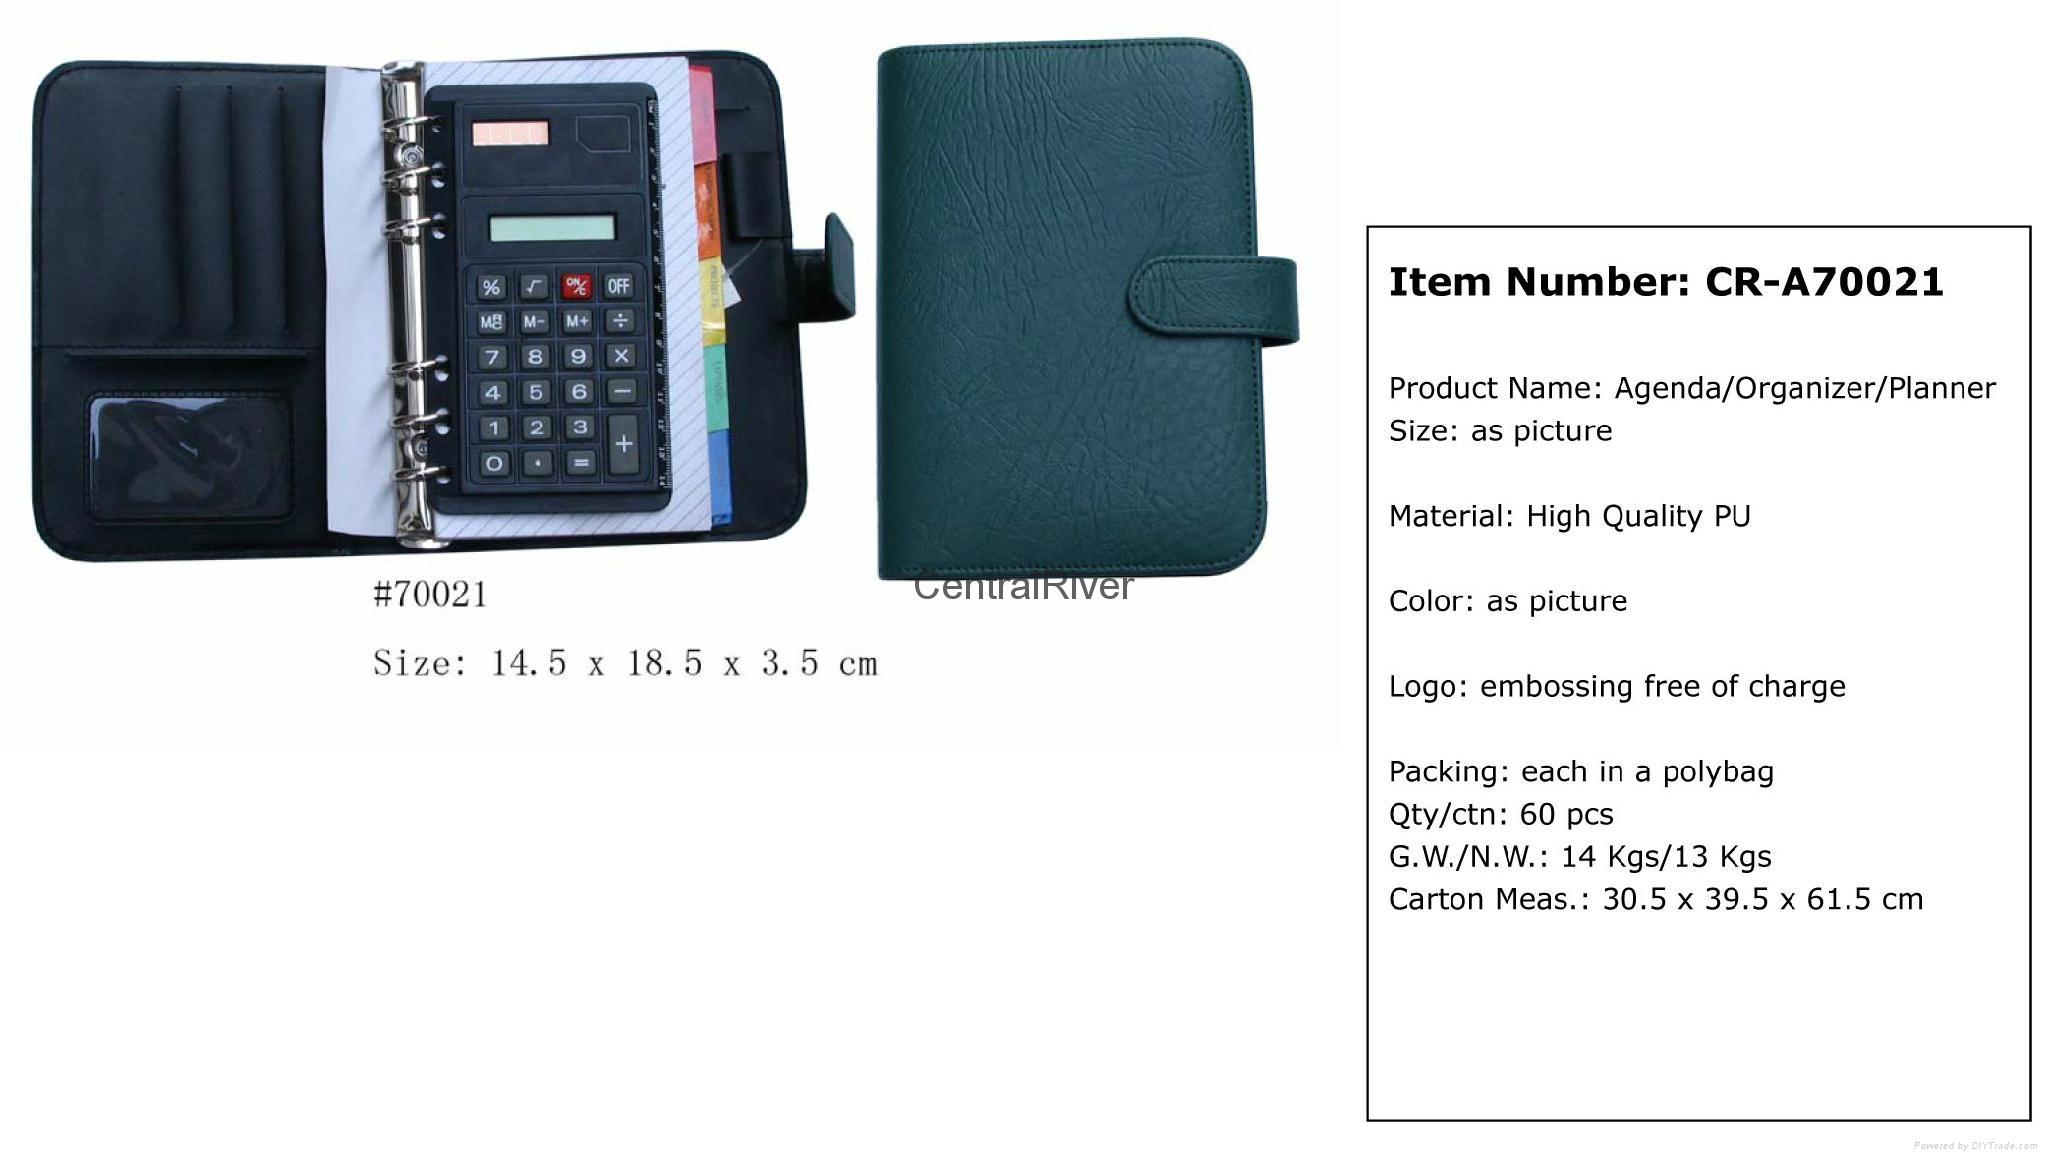 Agenda planner ring binder with calculator  1